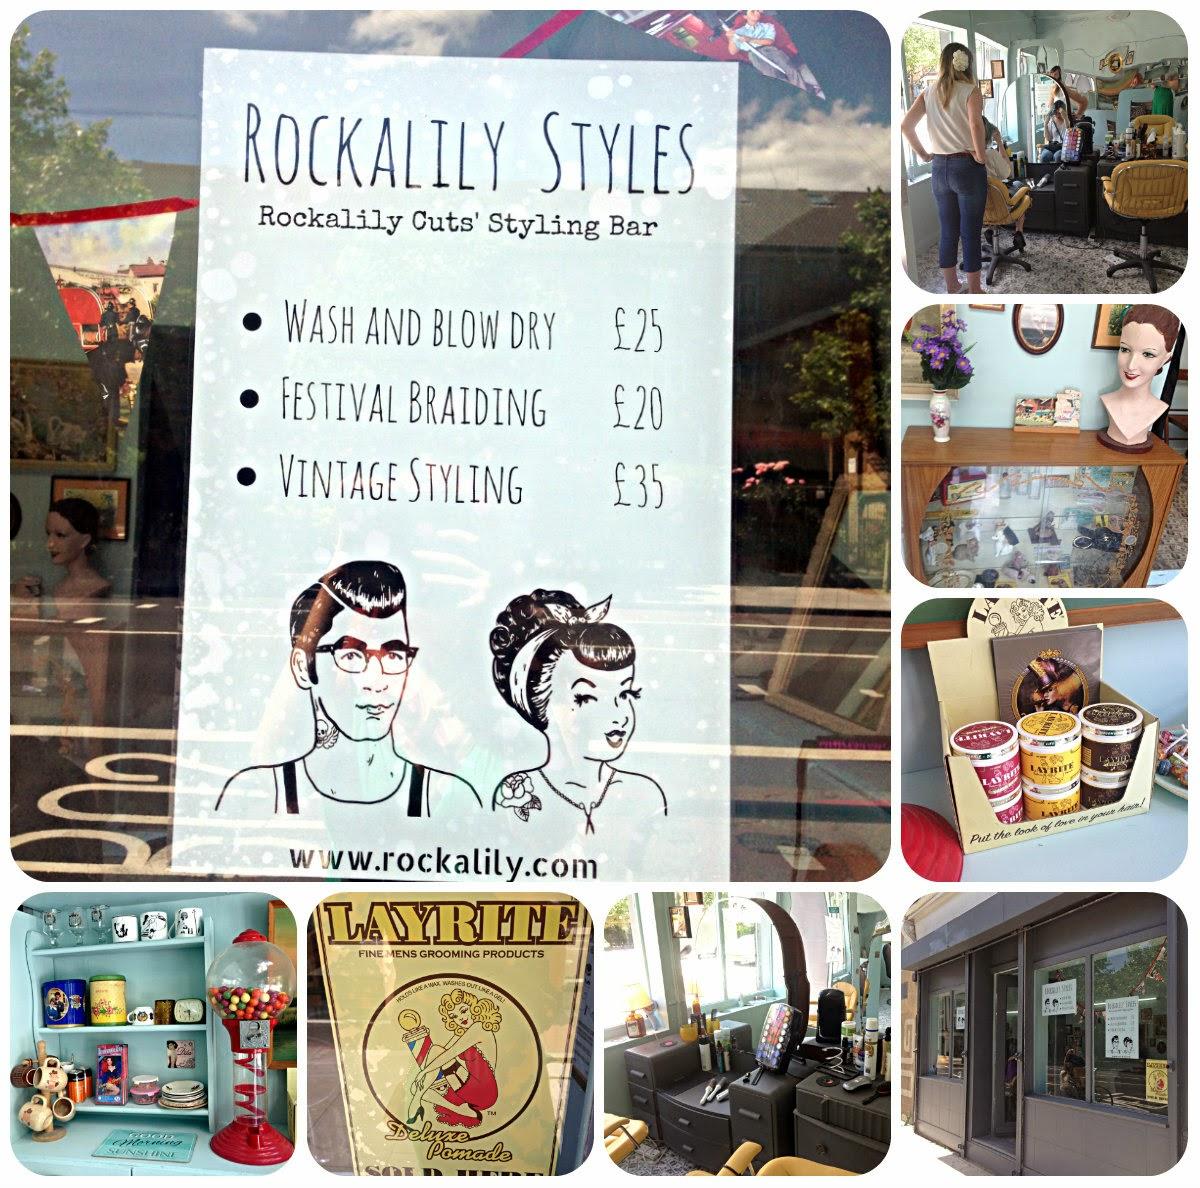 Rockalily Styles: Styling Bar